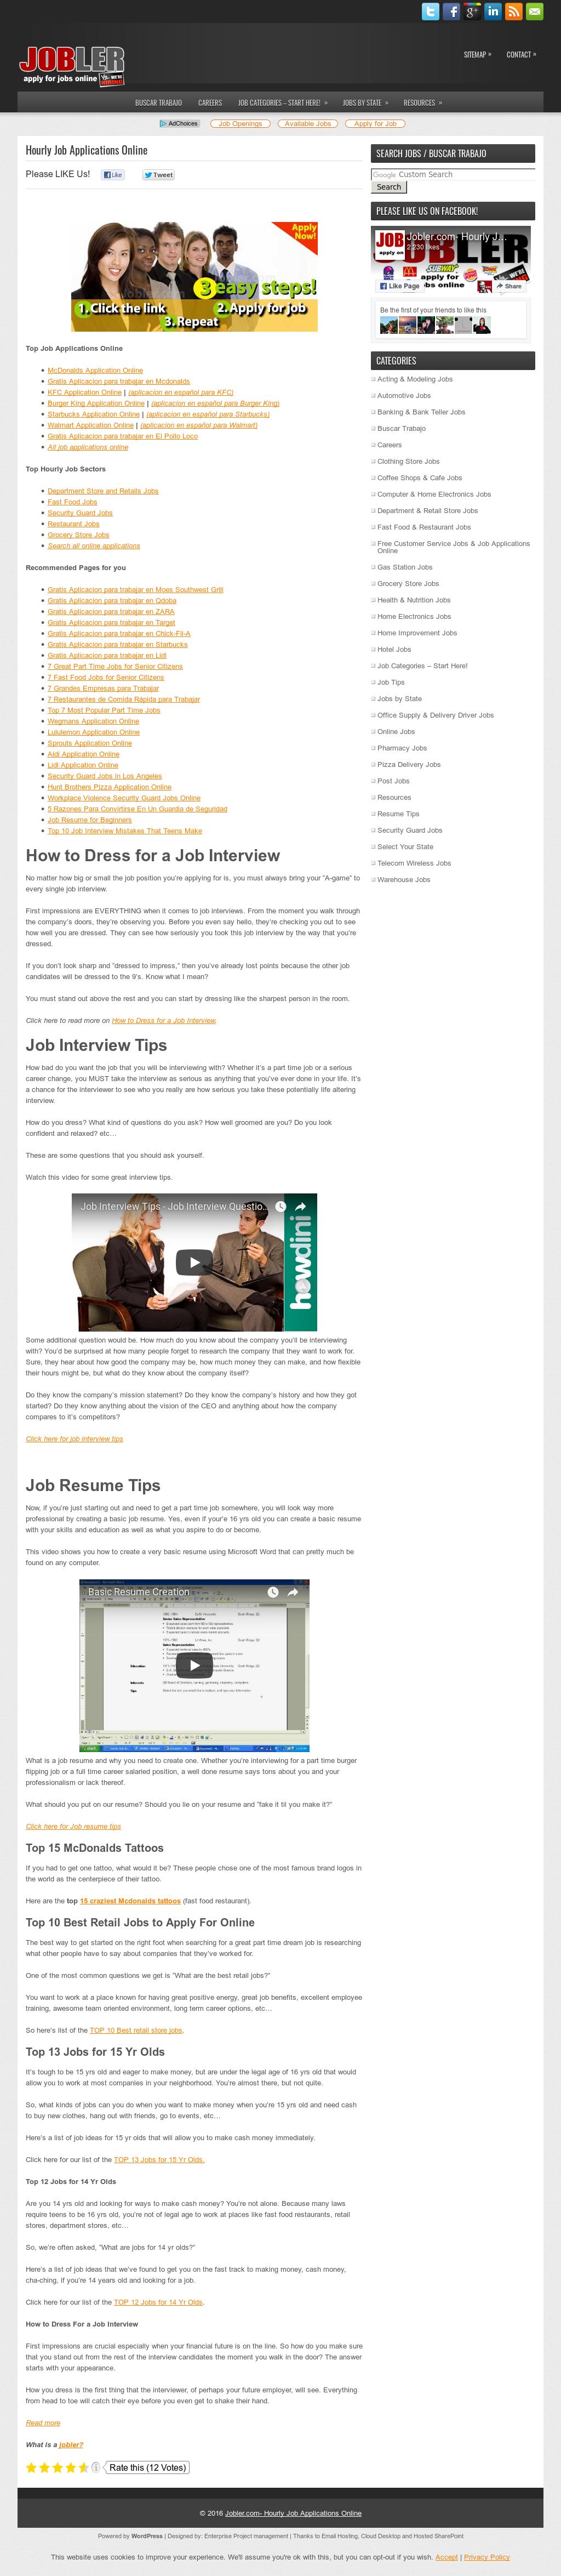 online job applications for teens